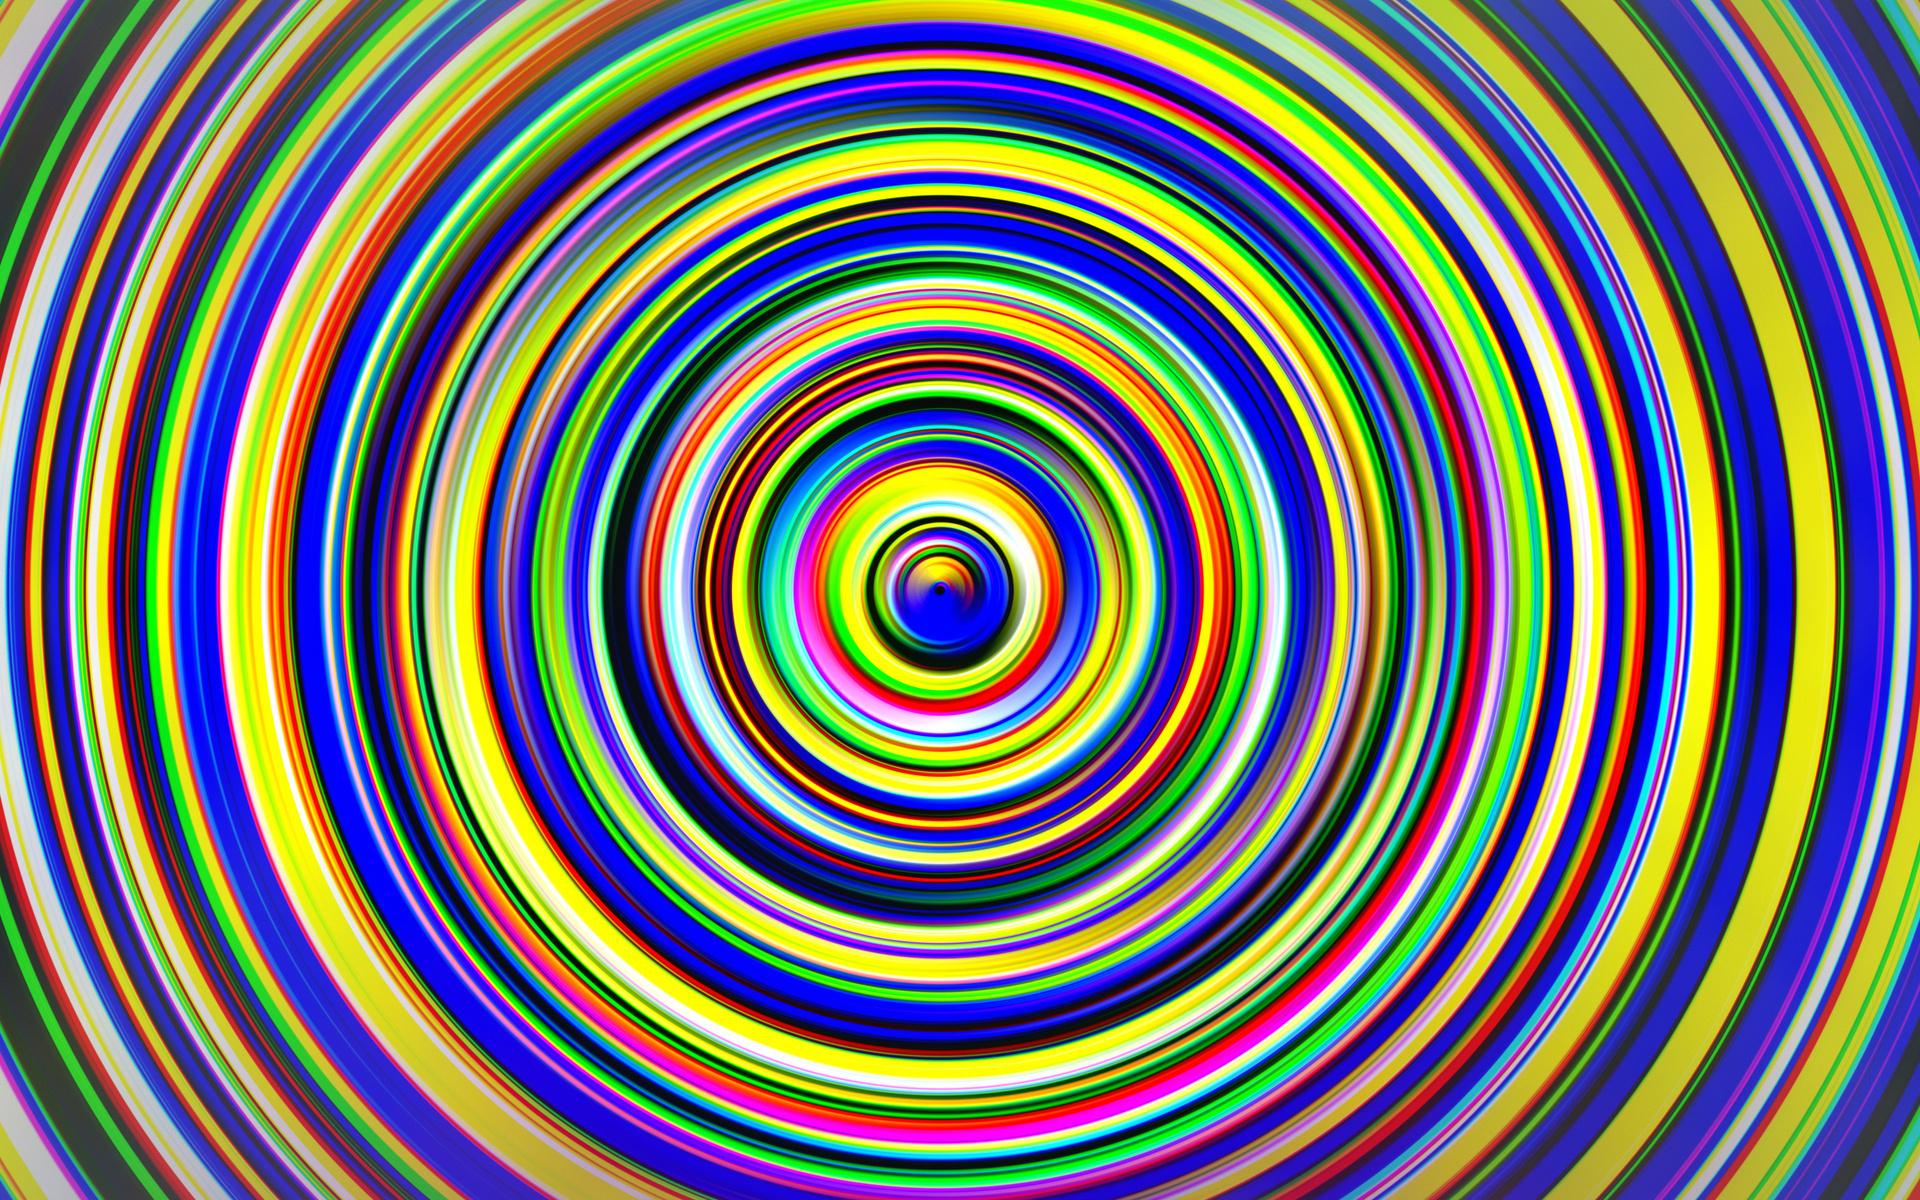 abstract brain wallpaper mind - photo #15